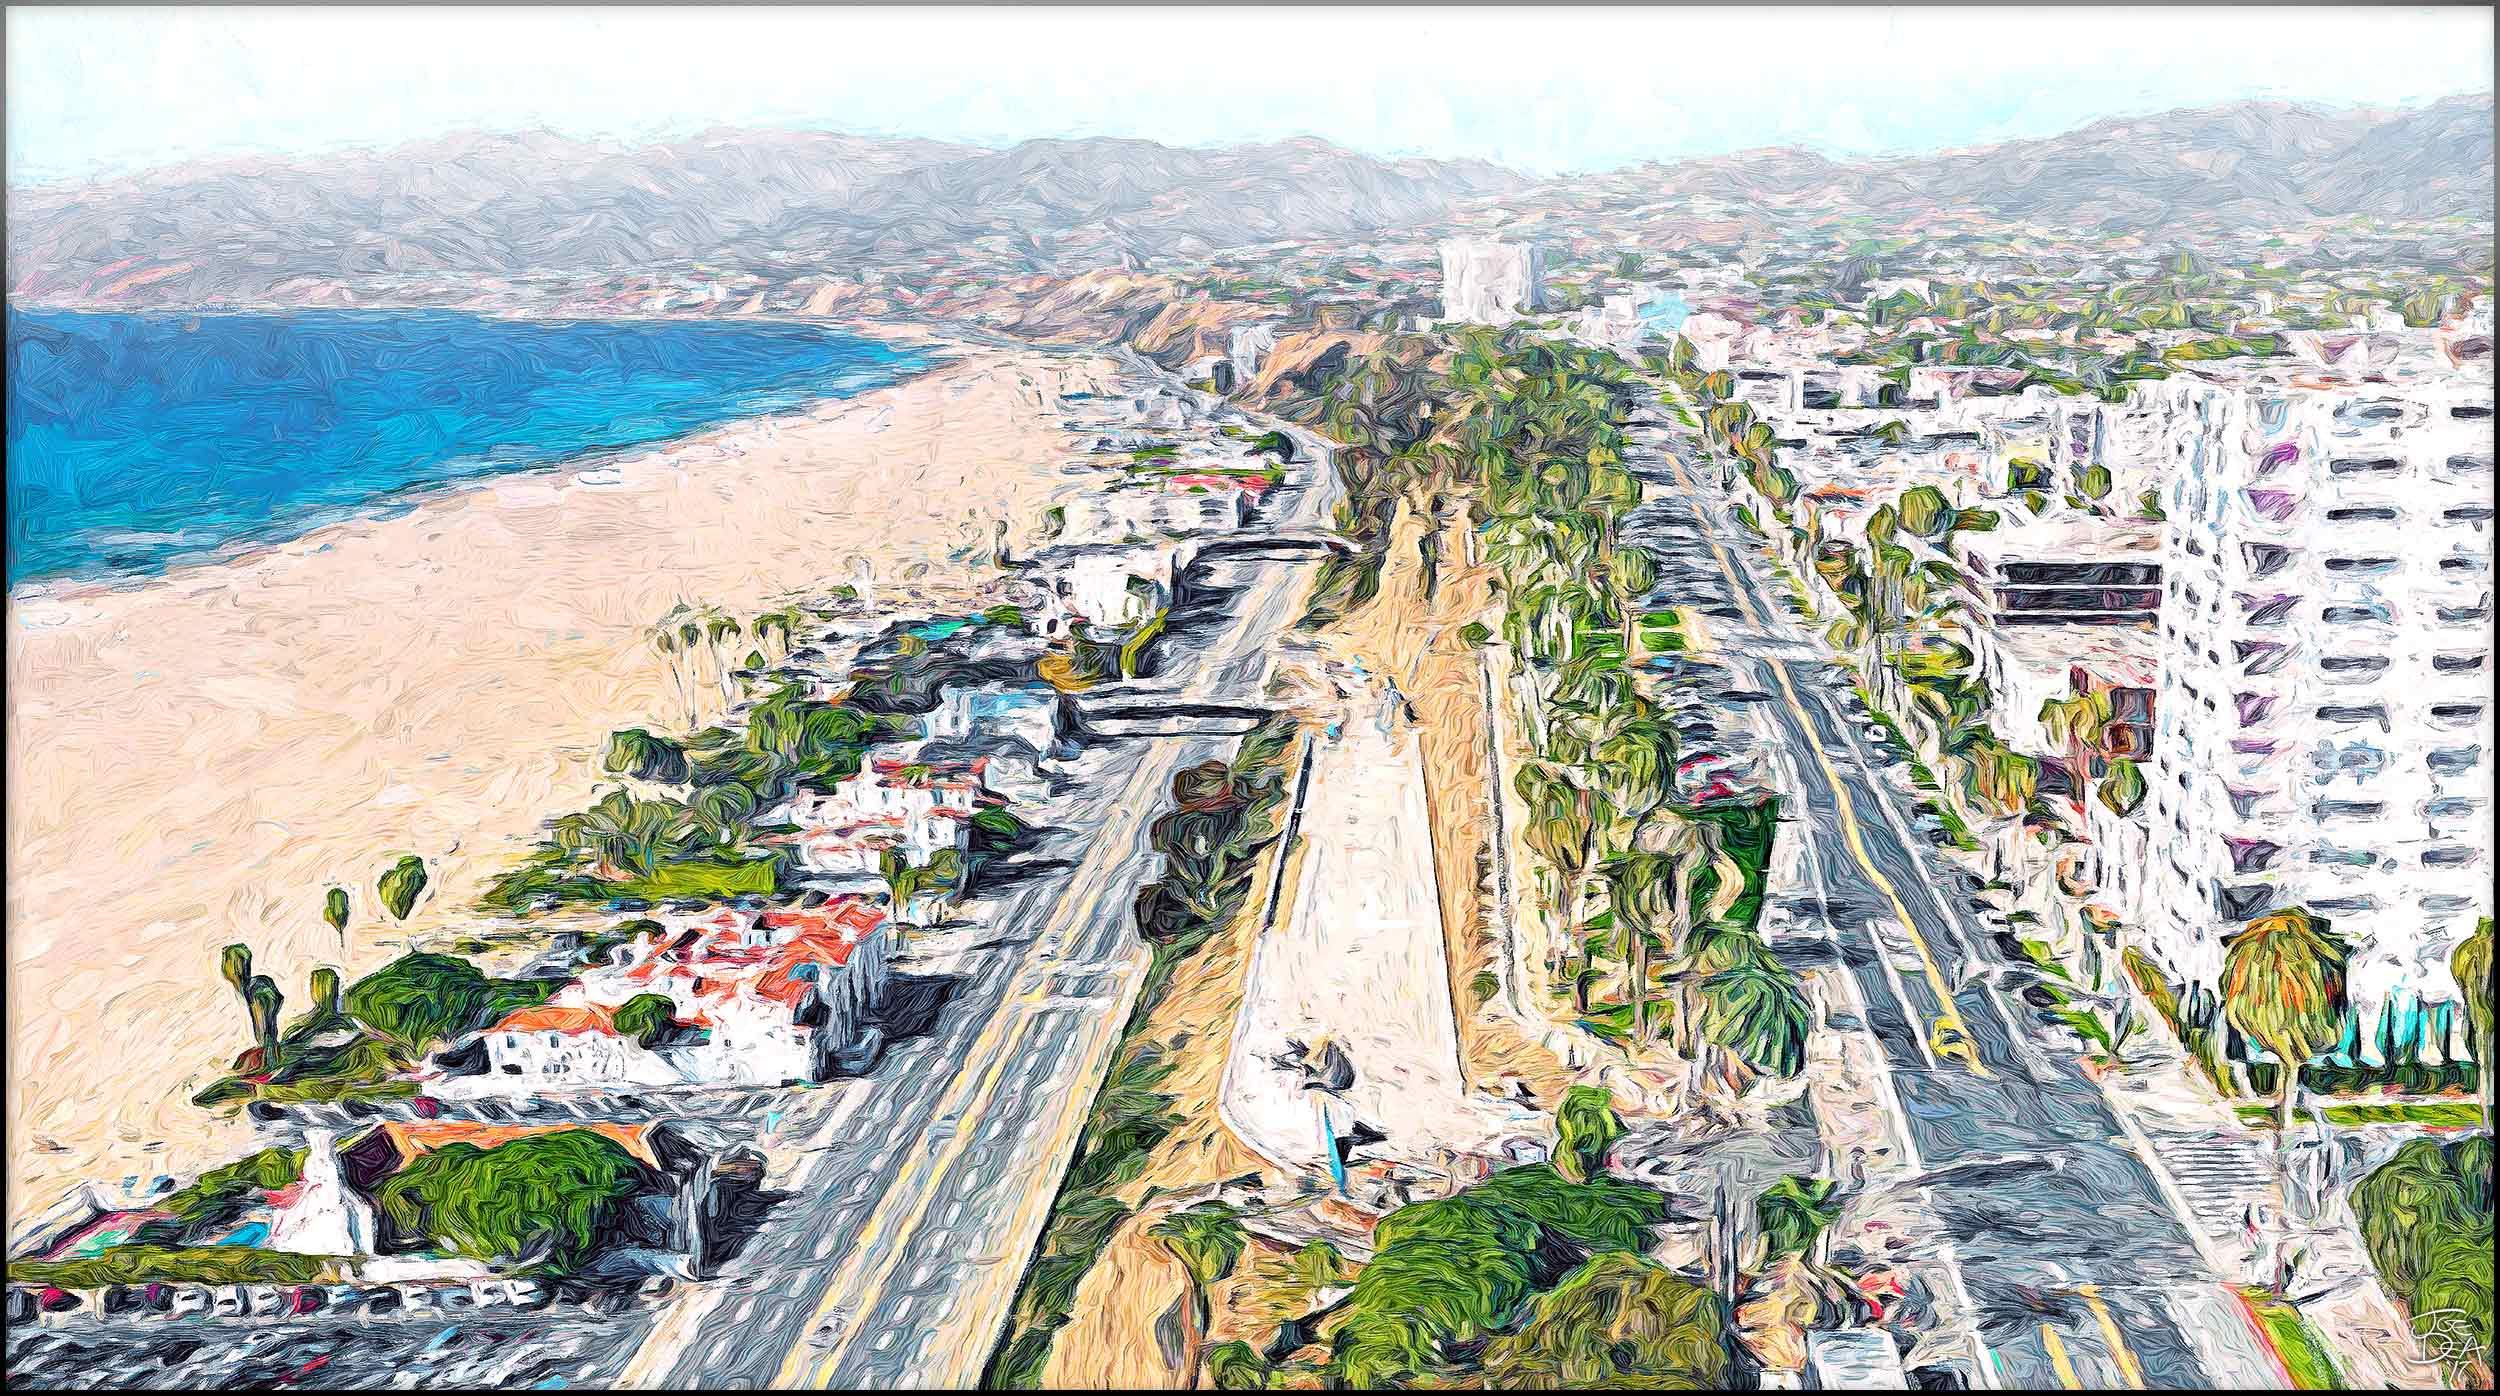 PCH Santa Monica Incline